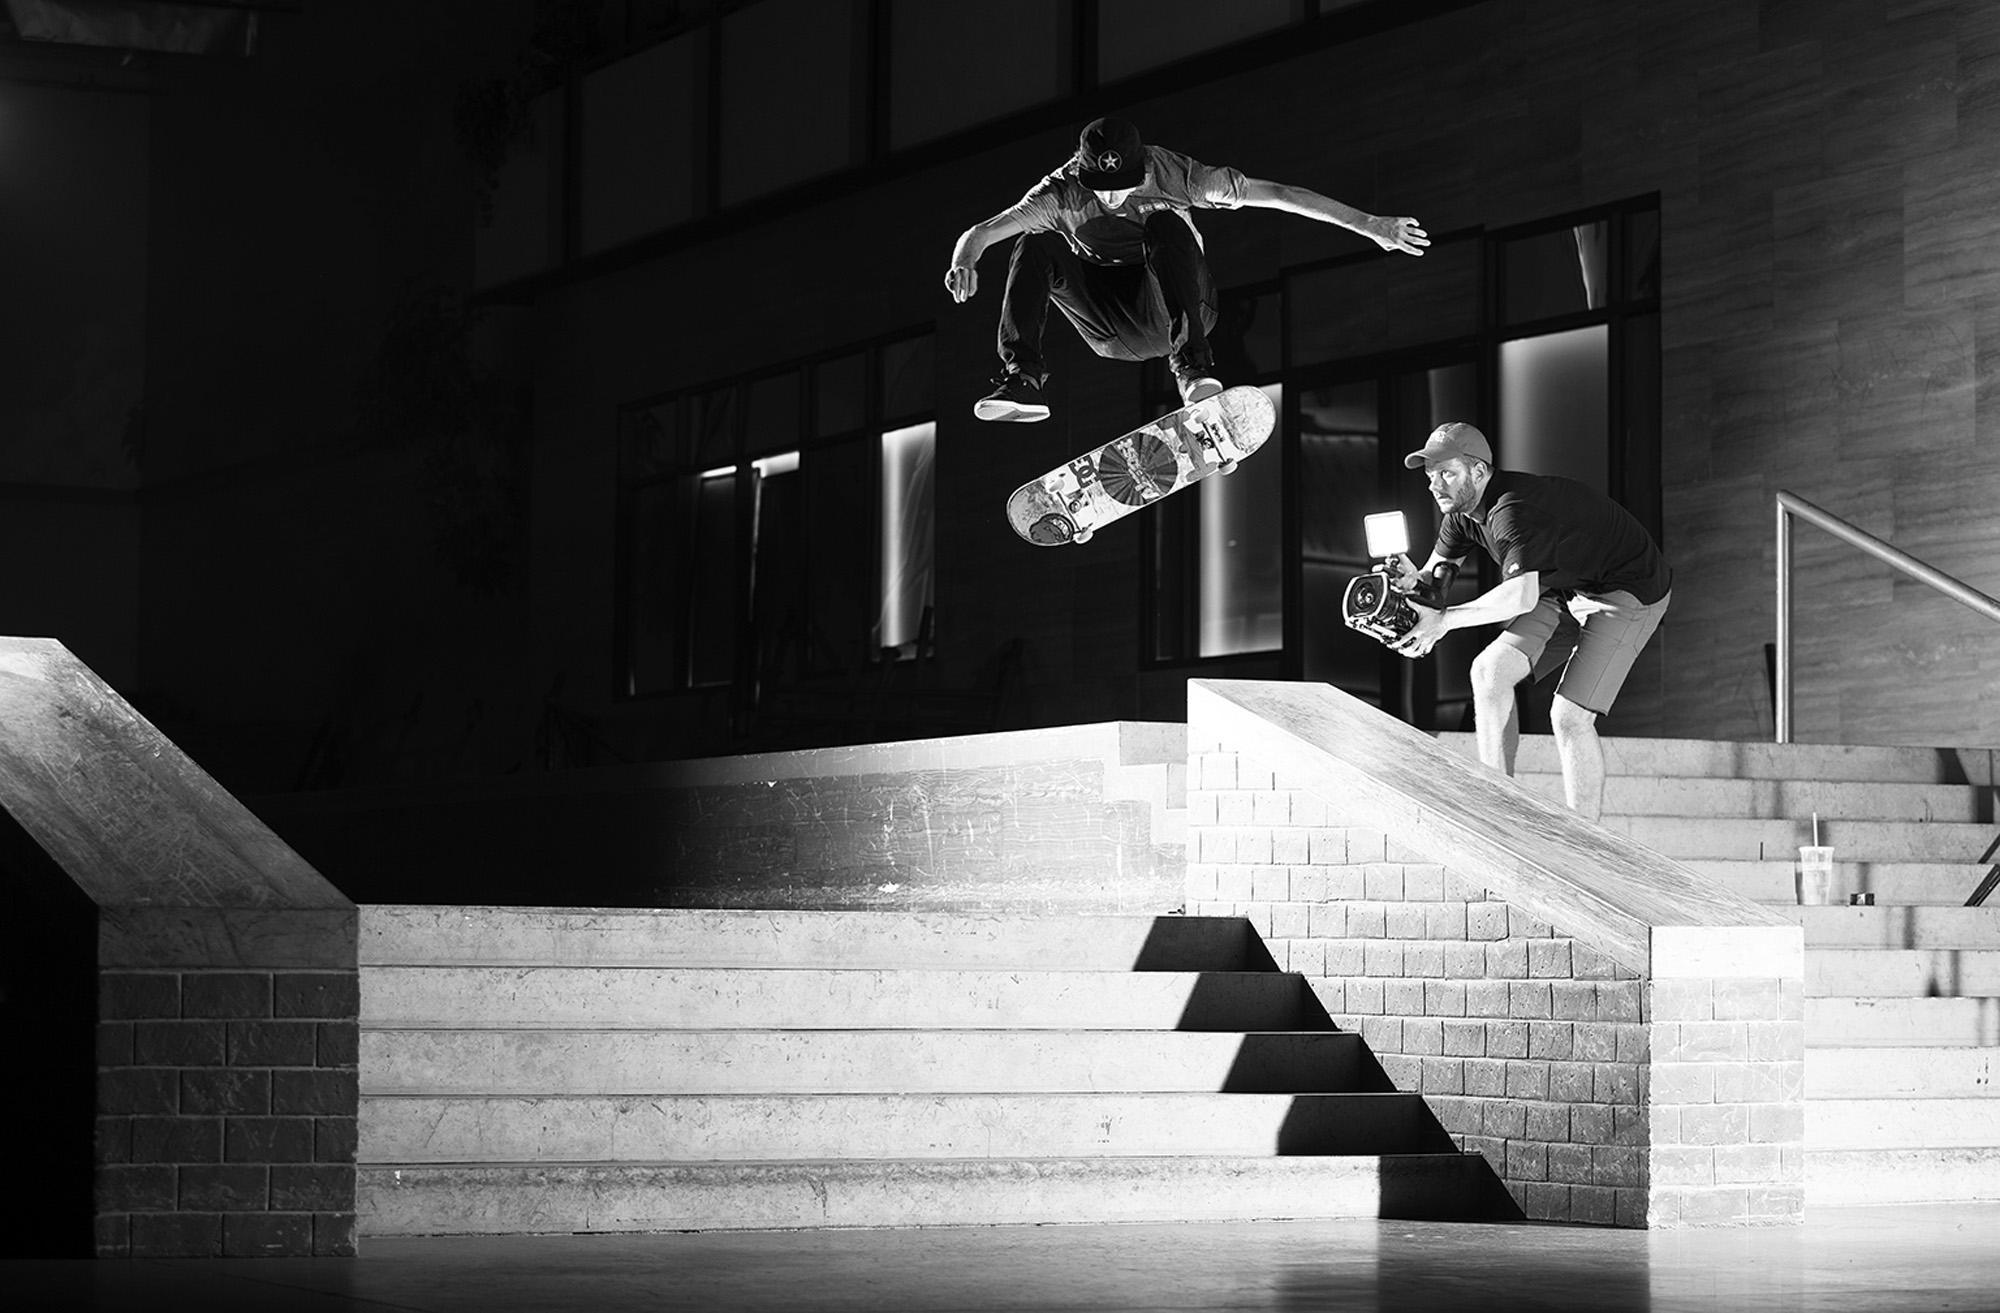 Tyson Bowerbank Almost Skateboards - The Berrics Recruit